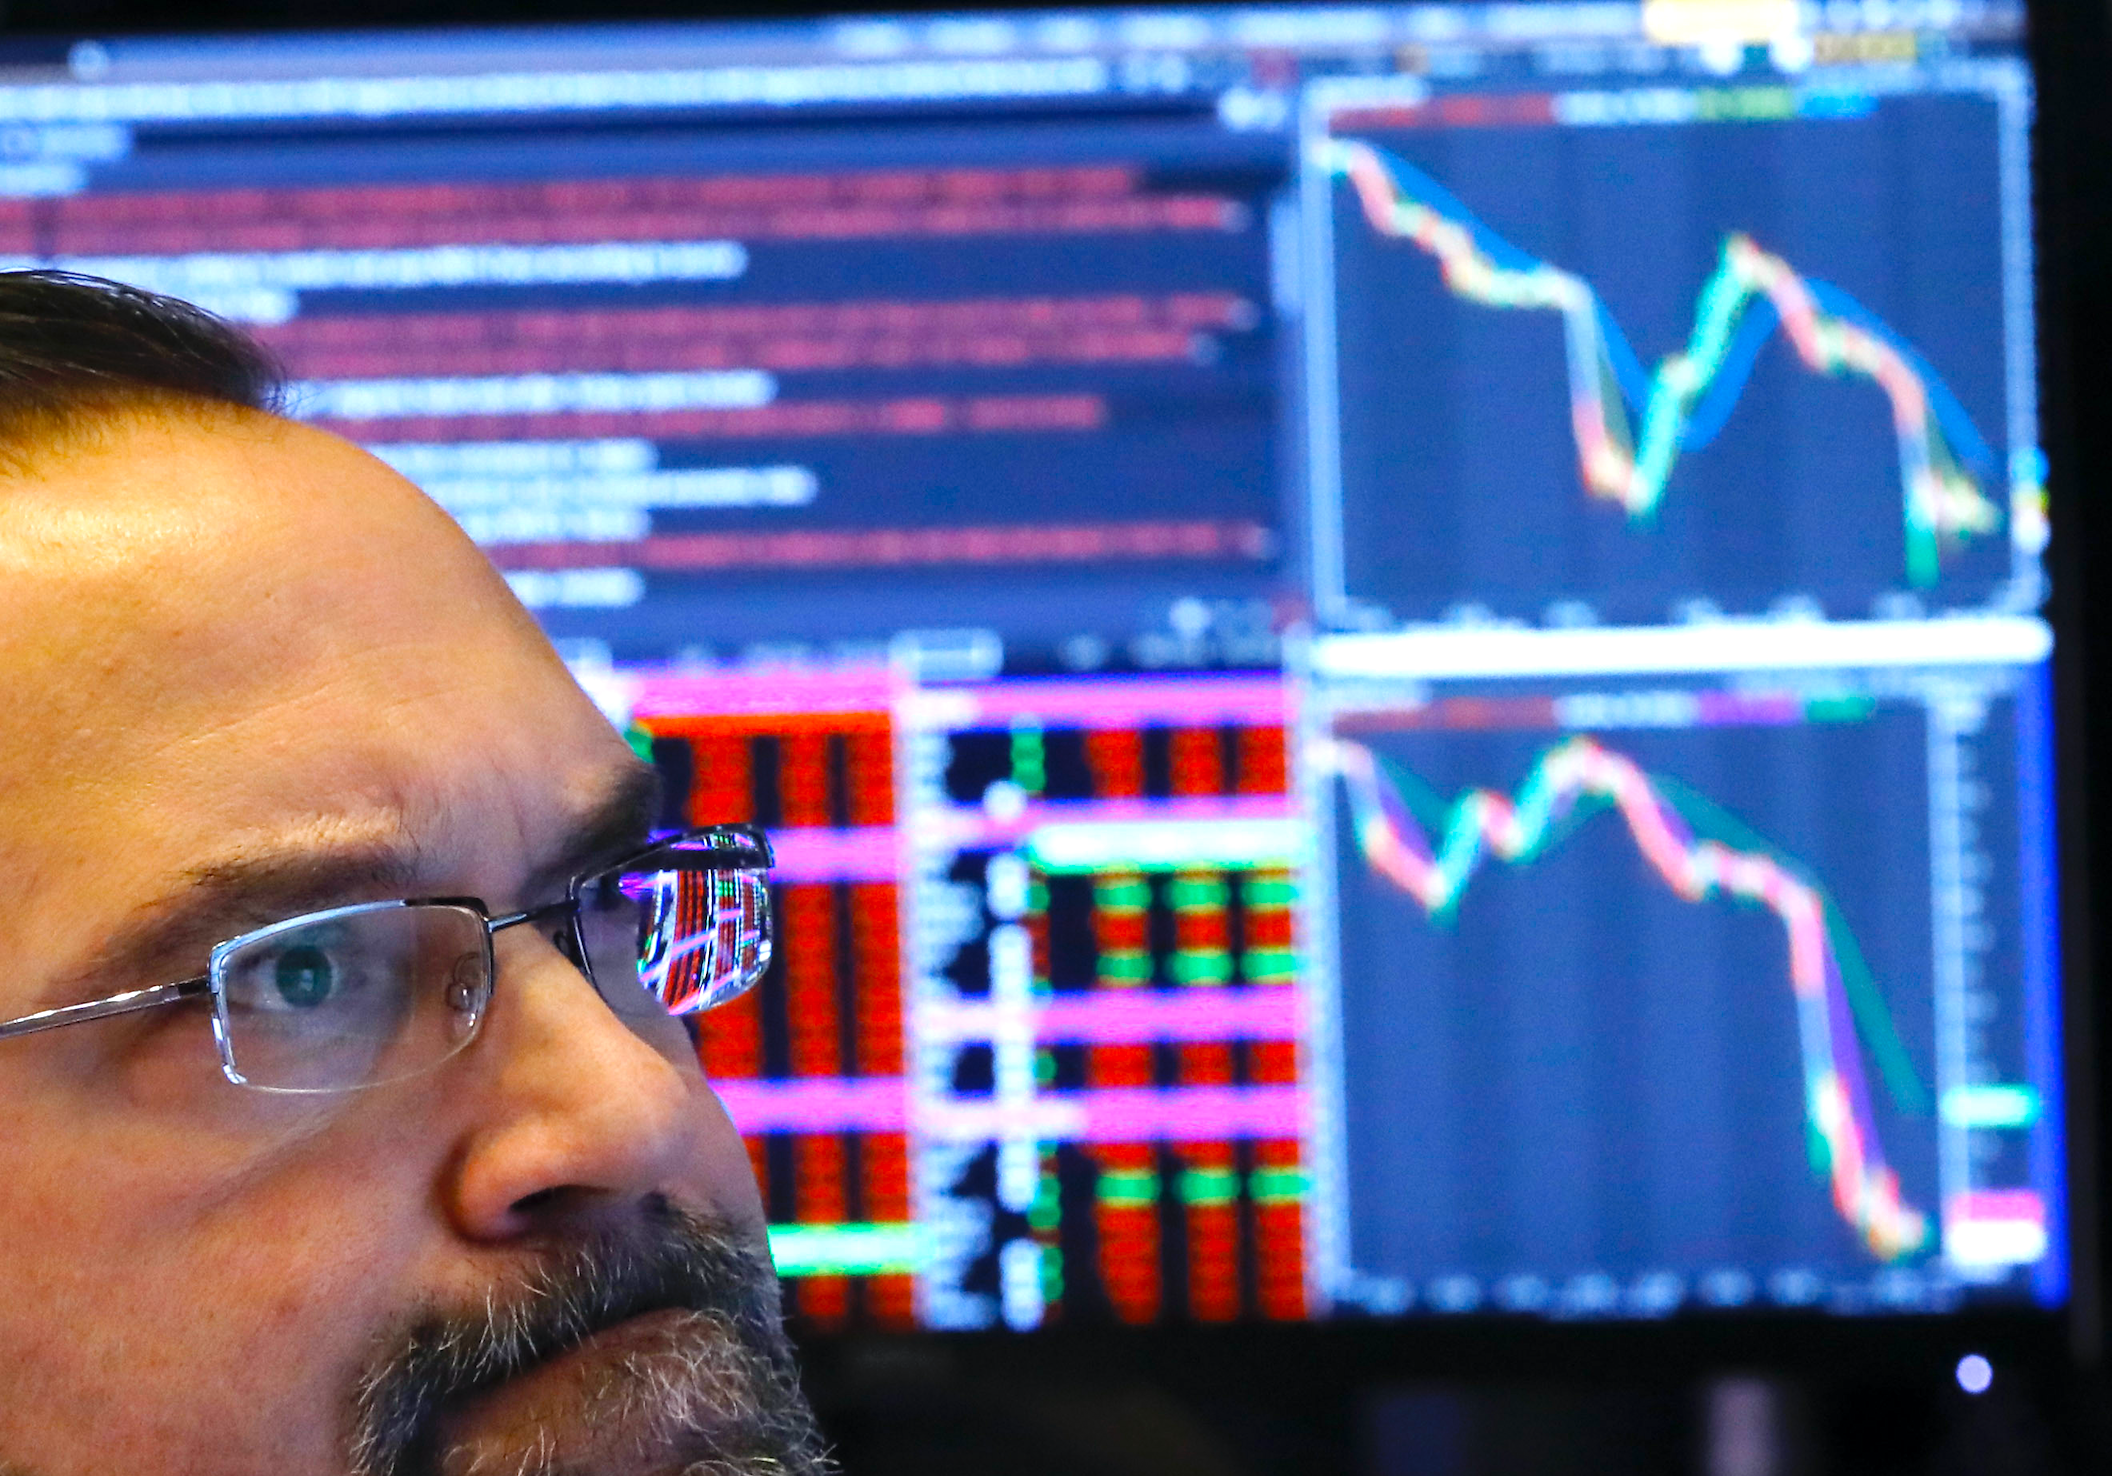 Goldman Sachs warns stocks have further to fall as profits turn to losses